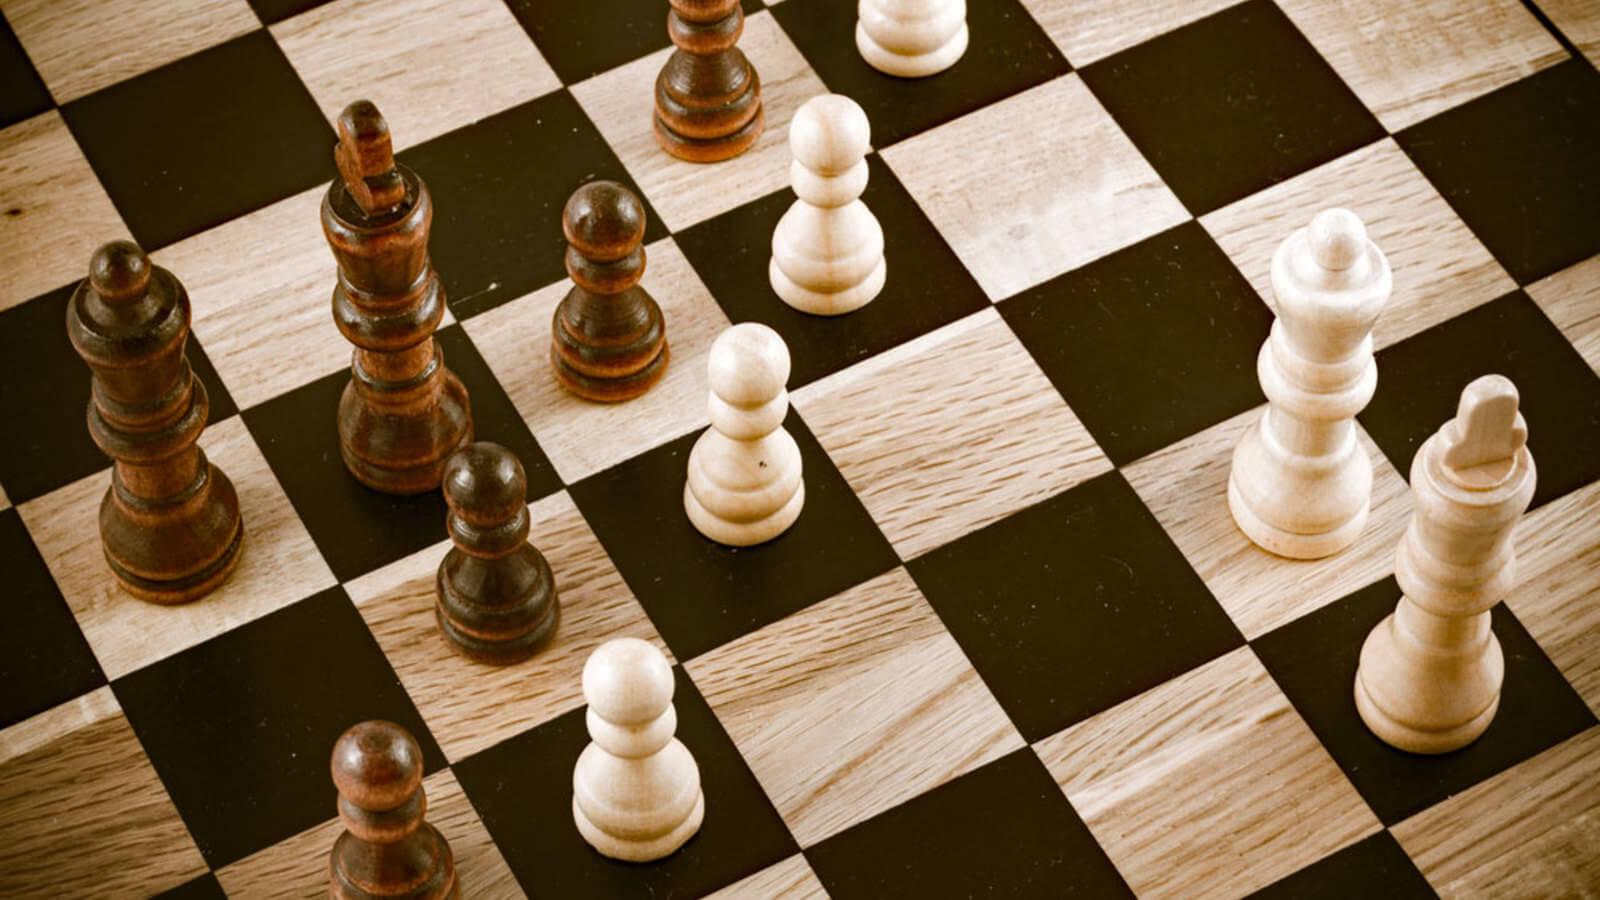 Chesss Hobby